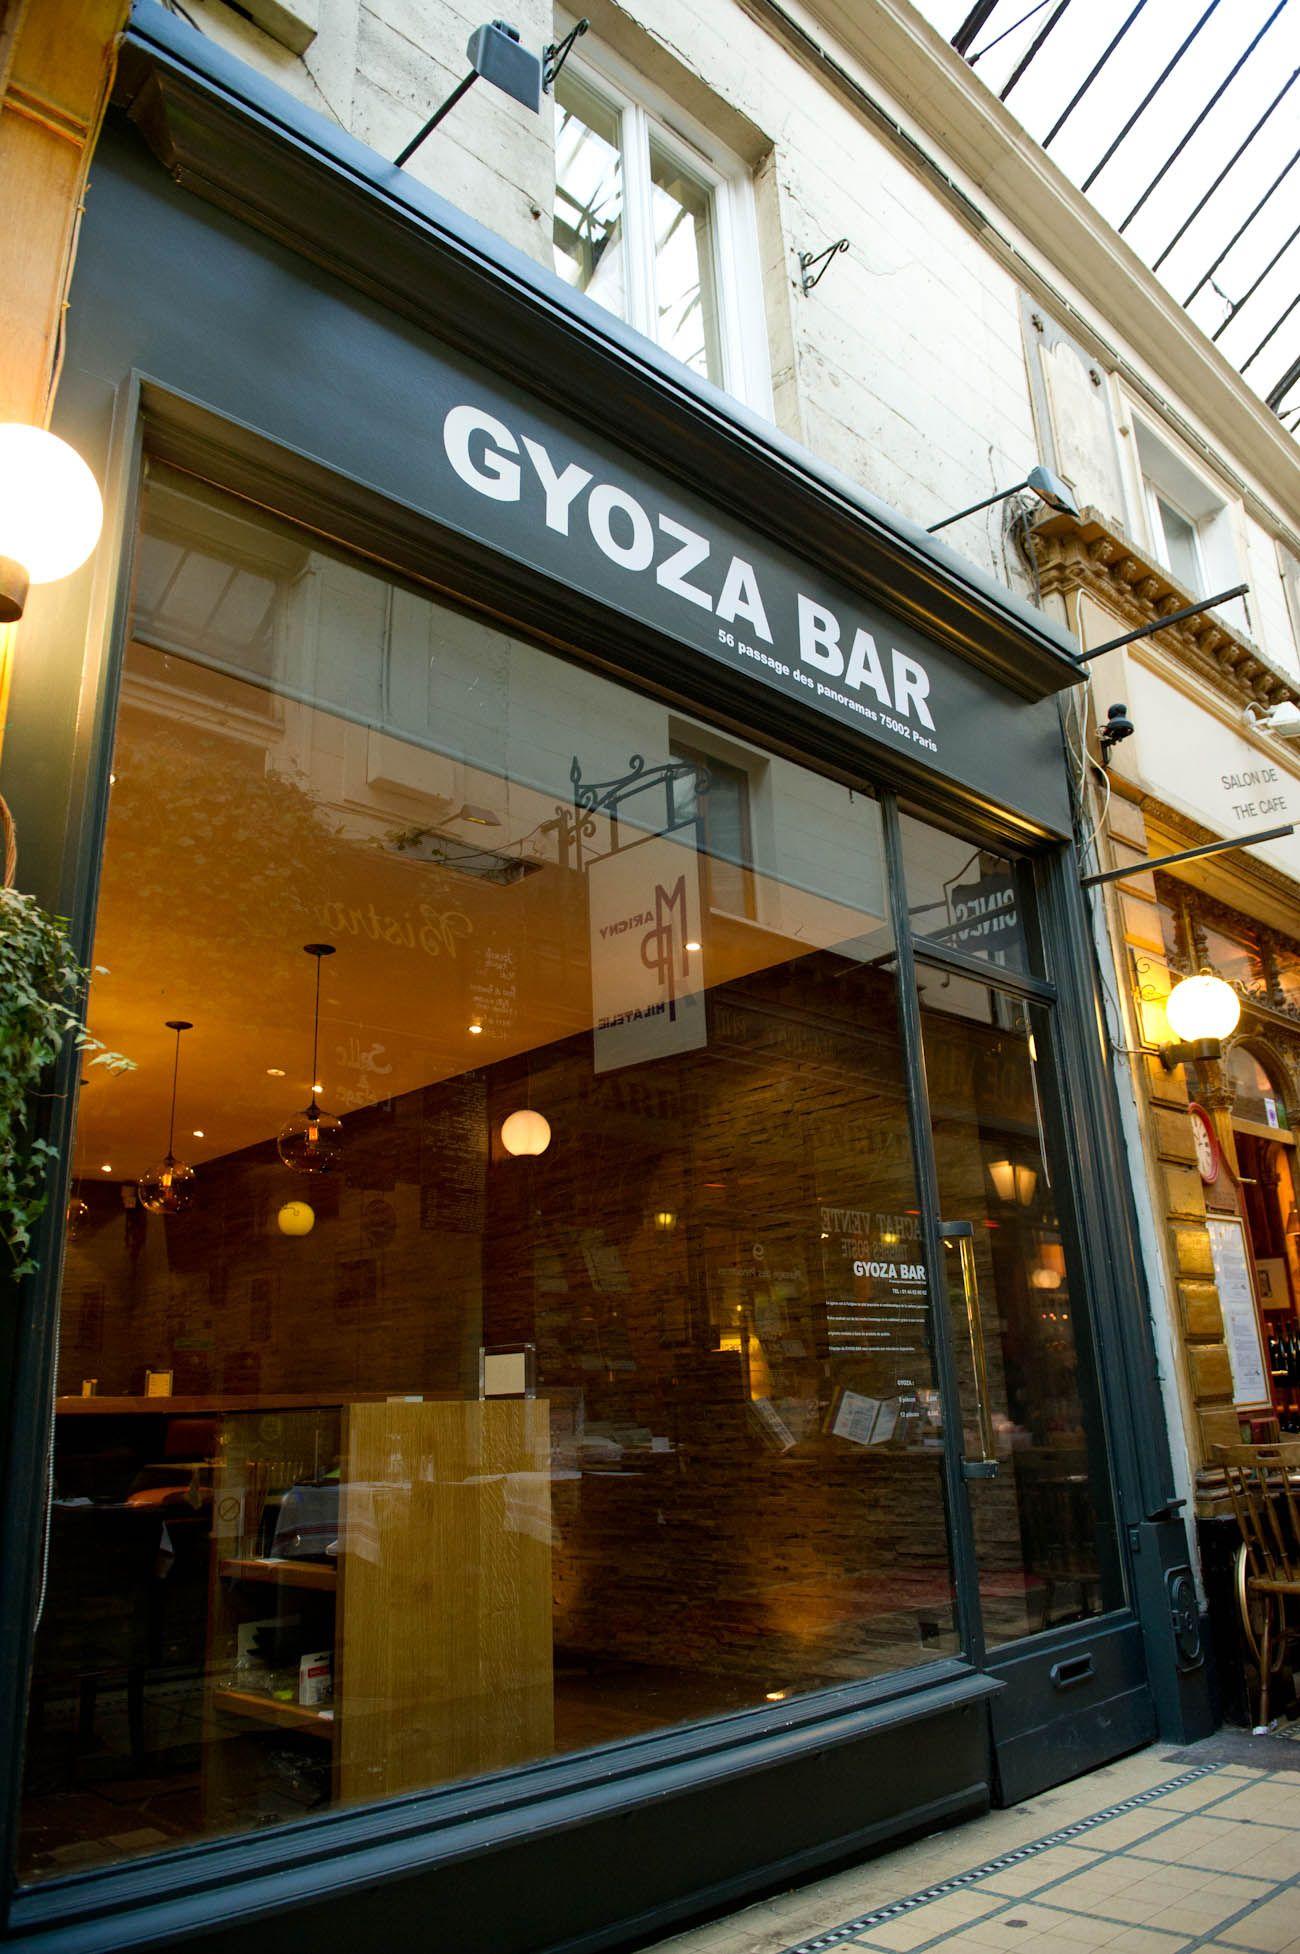 gyoza bar 75002 paris all things food galerie paris. Black Bedroom Furniture Sets. Home Design Ideas